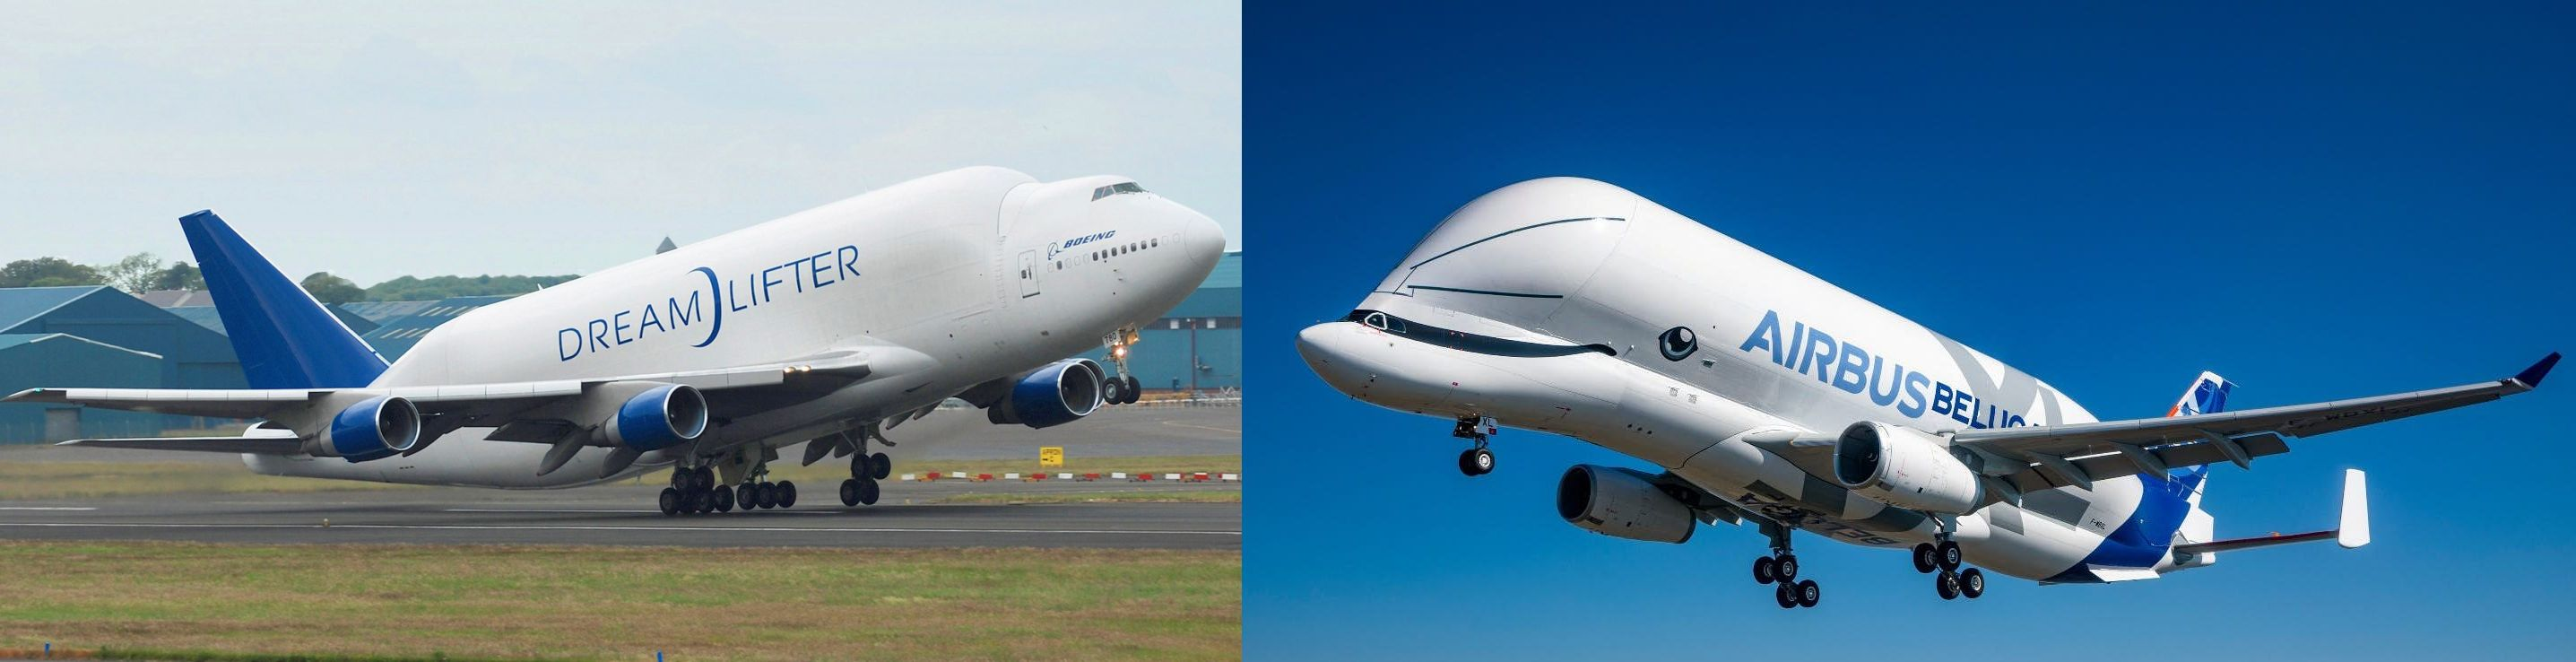 (fotók: Airbus, Boeing)